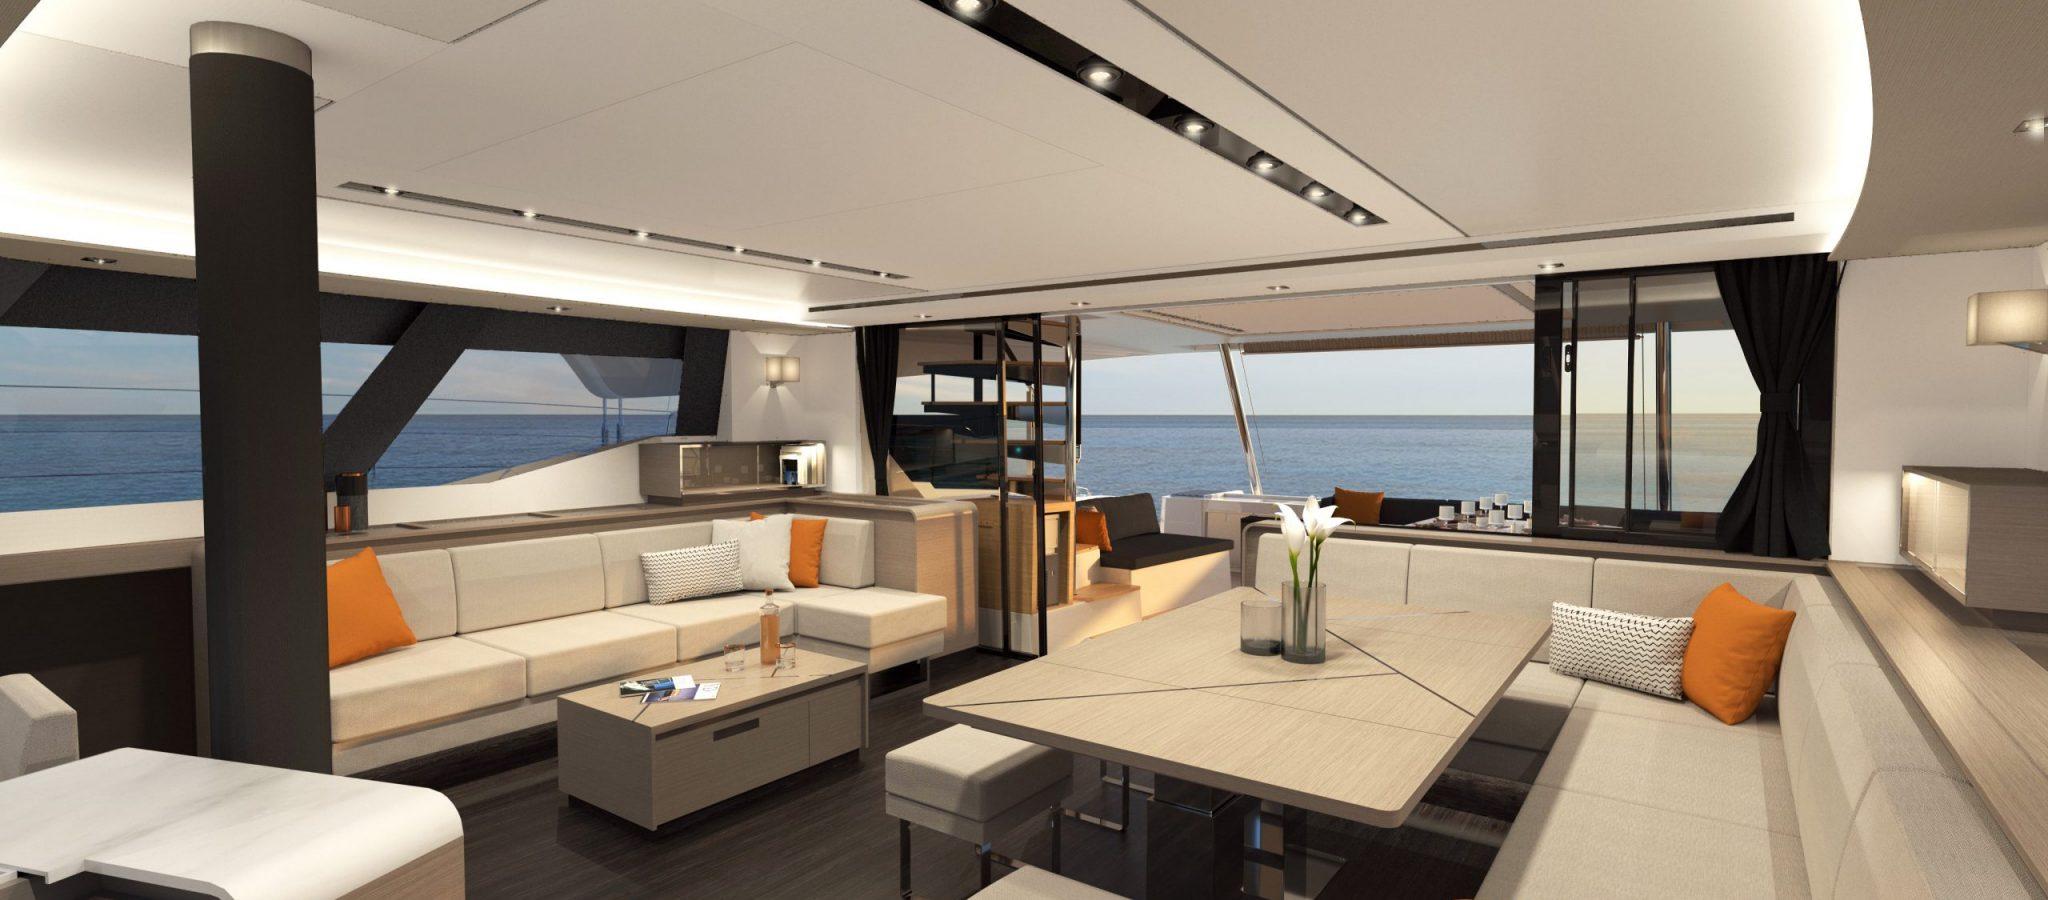 Samana-59-Fountaine-Pajot-Sailing-Catamarans_maestro-cabin_Interior-006--7-